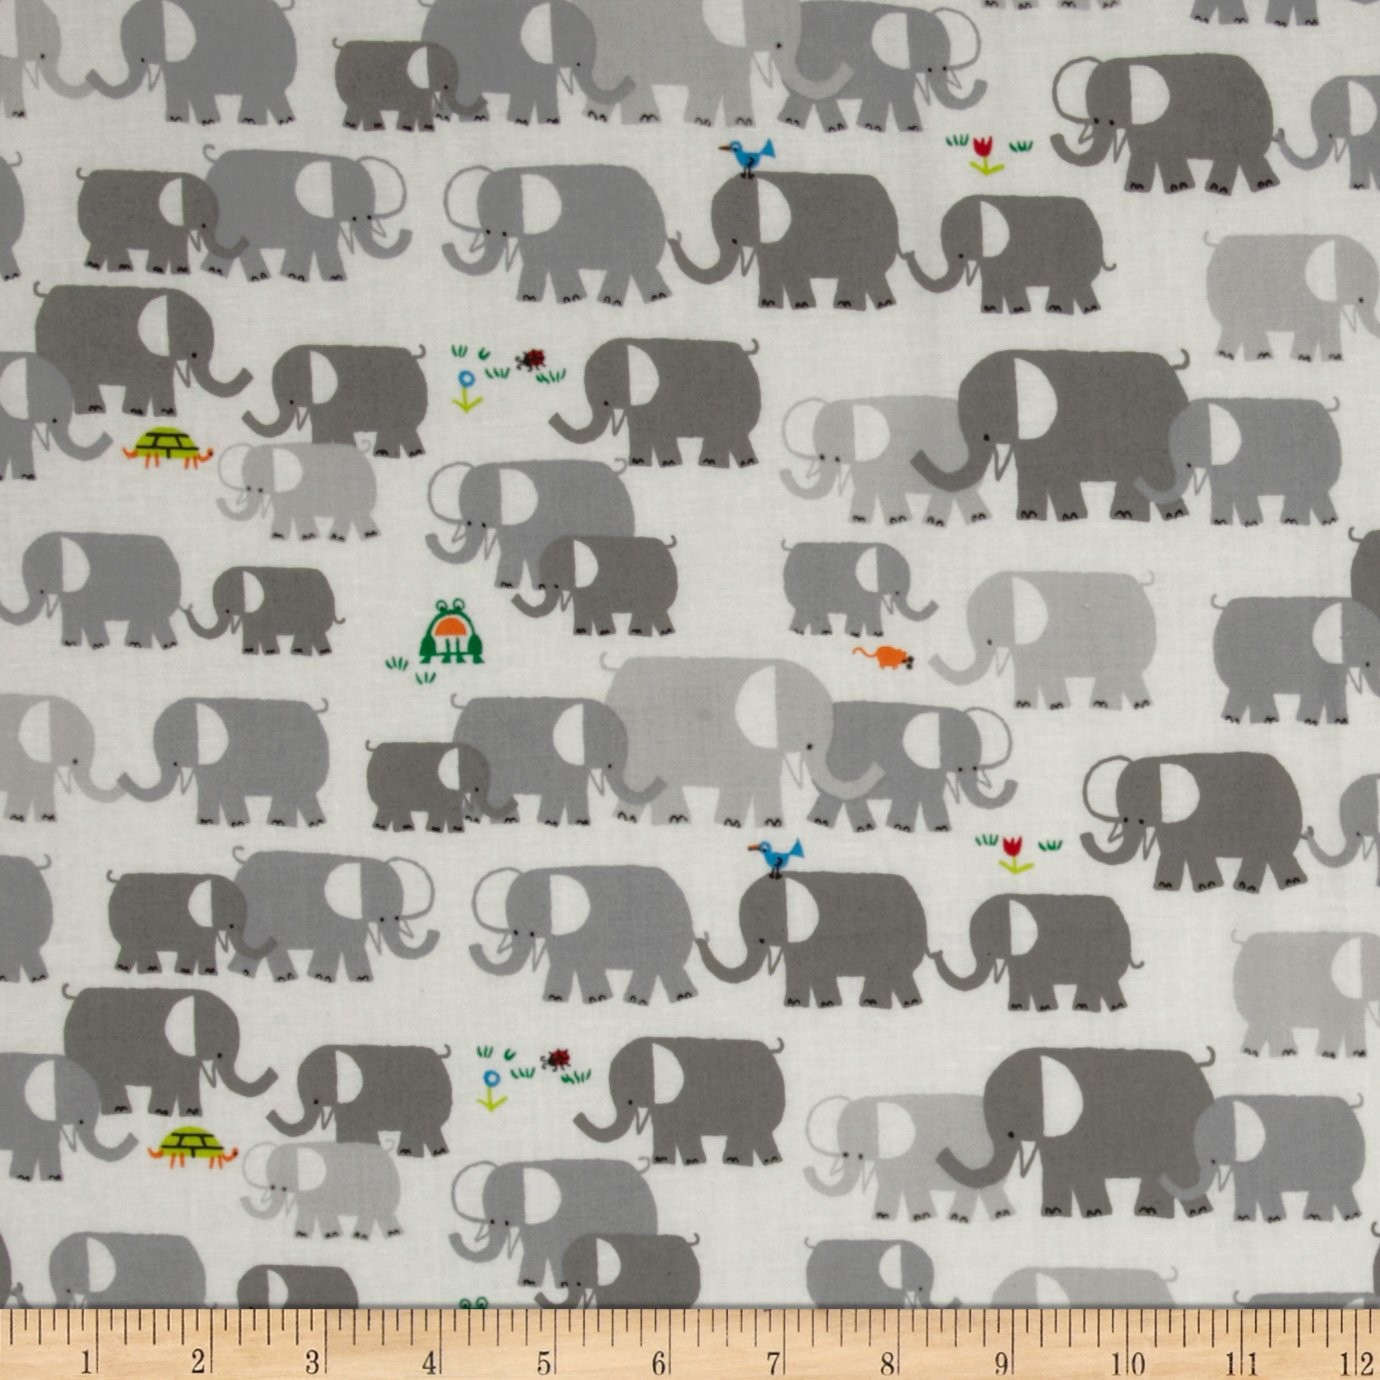 Happy Drawing Organic Elephant Grey Fabric [show z store] [pre order] cloud 9 w 01c quakeblast clear version c9 cloud9 quakeblast quake blast transformation action figure